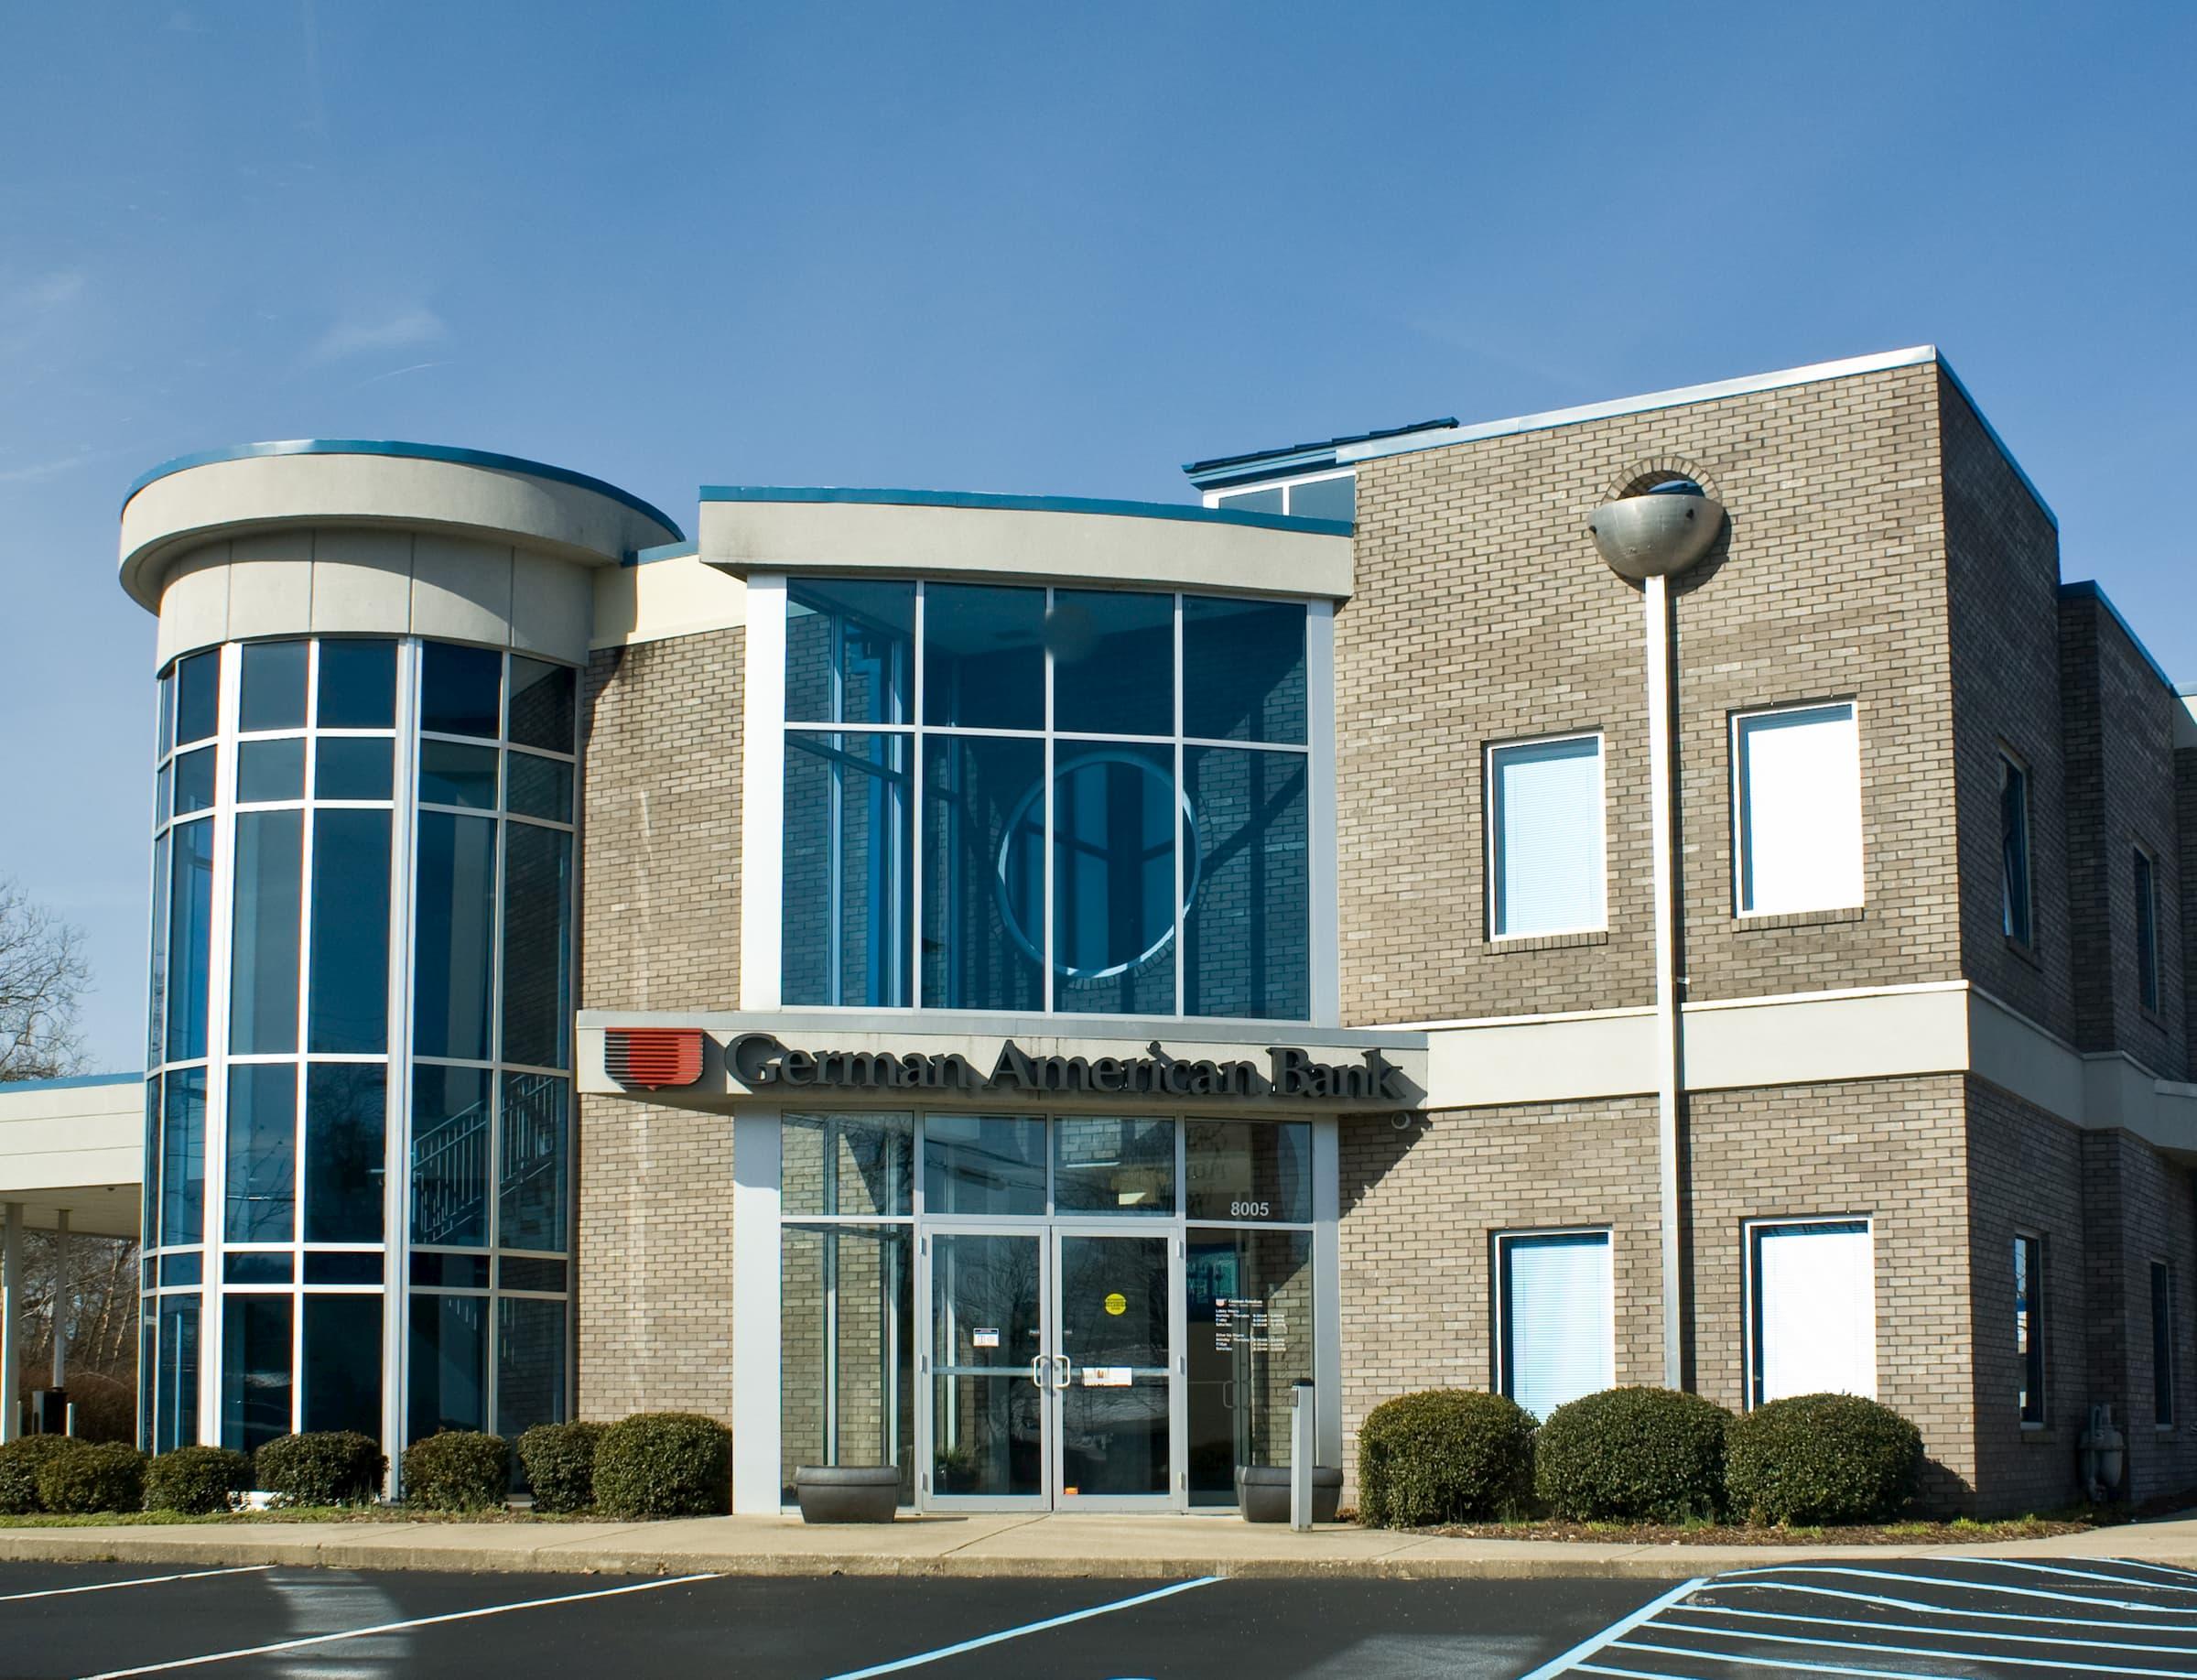 Commercial glass windows on a bank in Louisville Kentucky